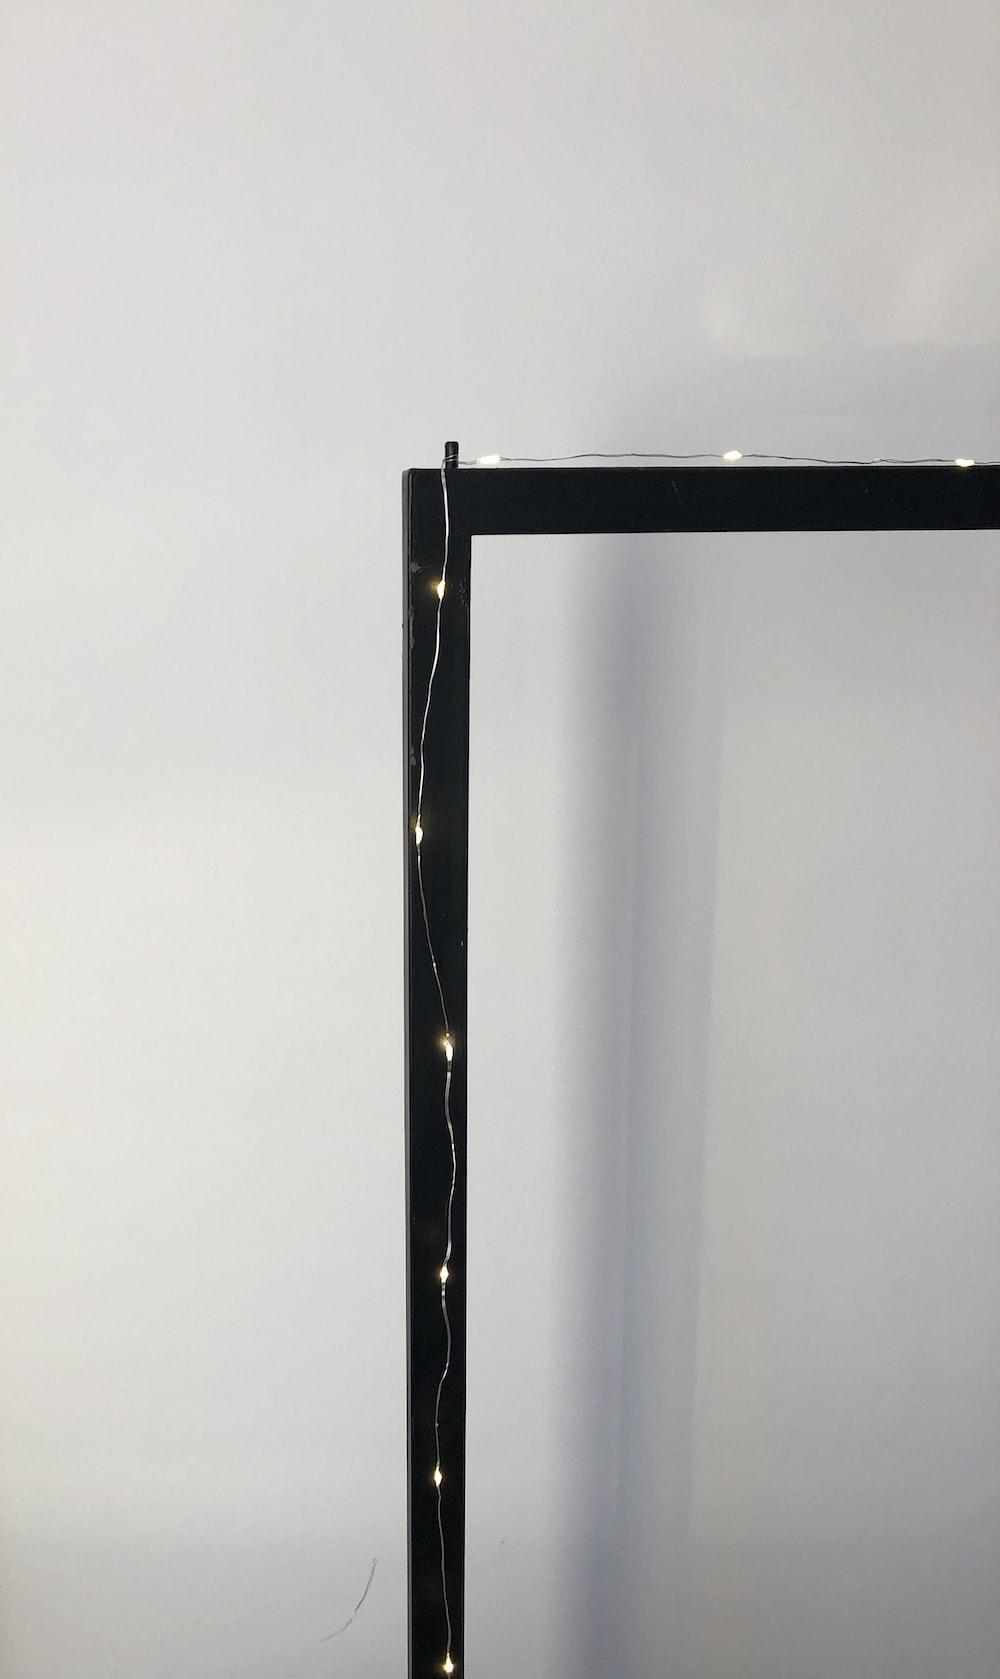 black metal frame near white wall